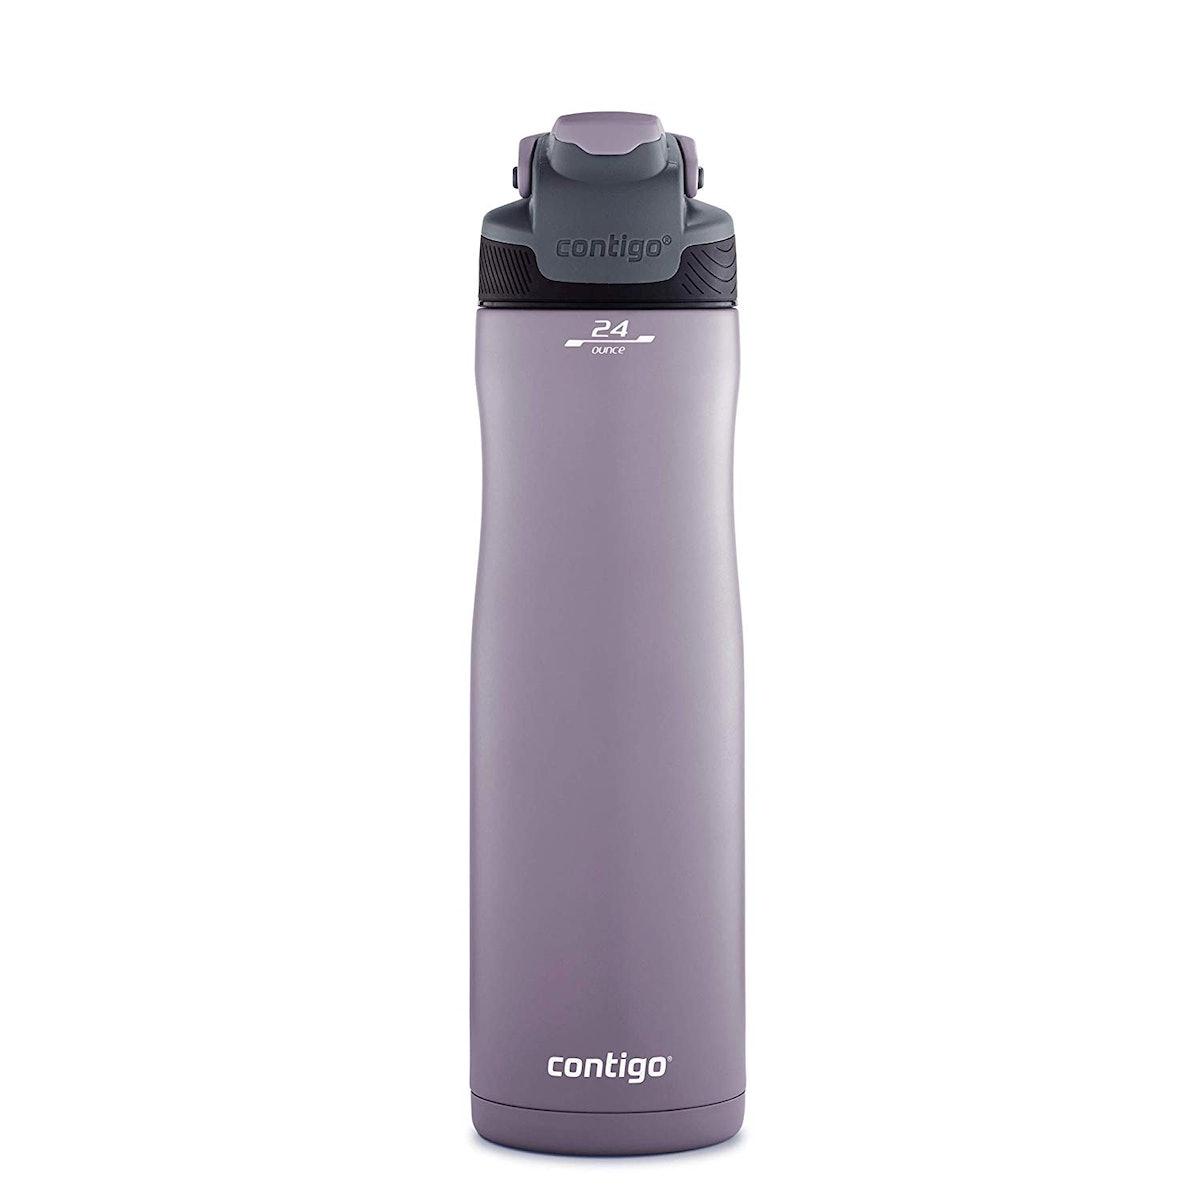 Contigo AUTOSEAL Stainless Steel Water Bottle